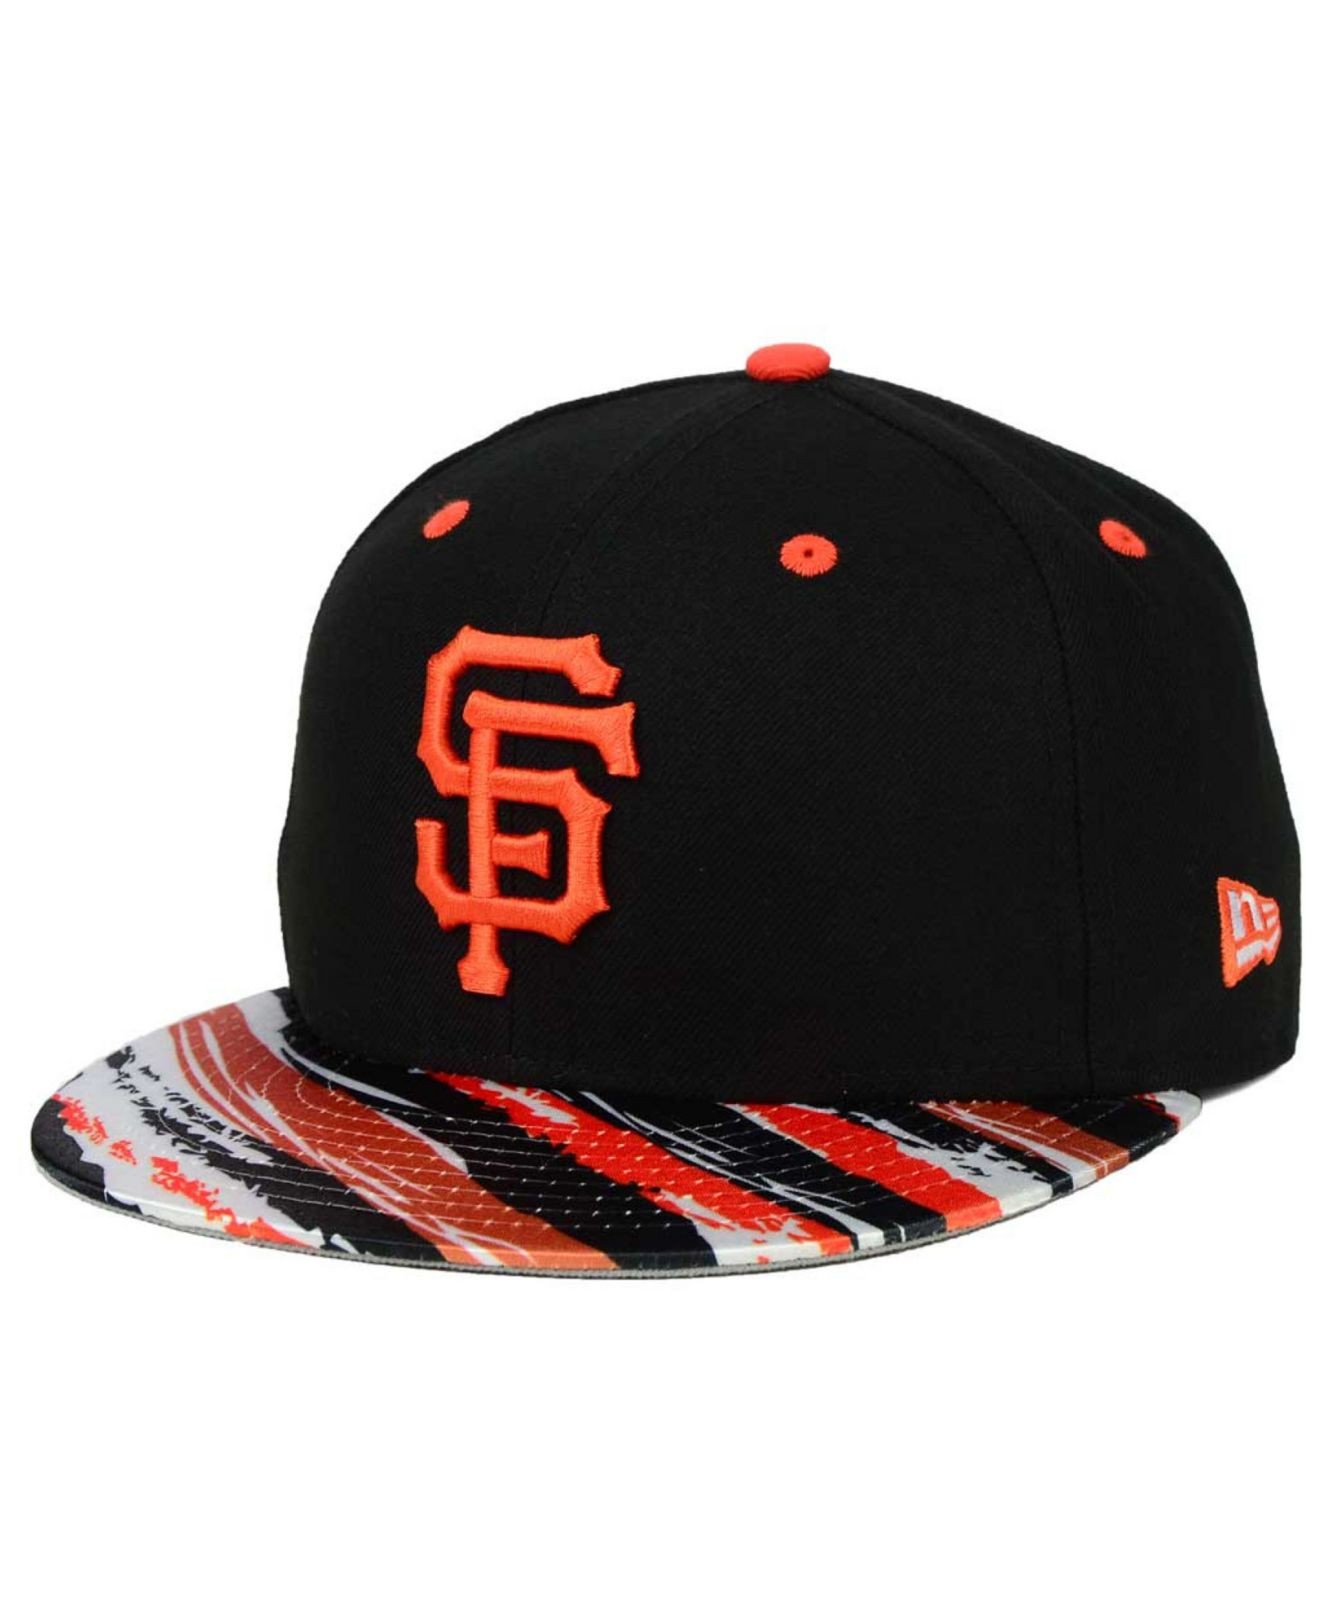 new arrival 7963f 8e257 Lyst - Ktz San Francisco Giants Action Print 59fifty Cap in Black ...